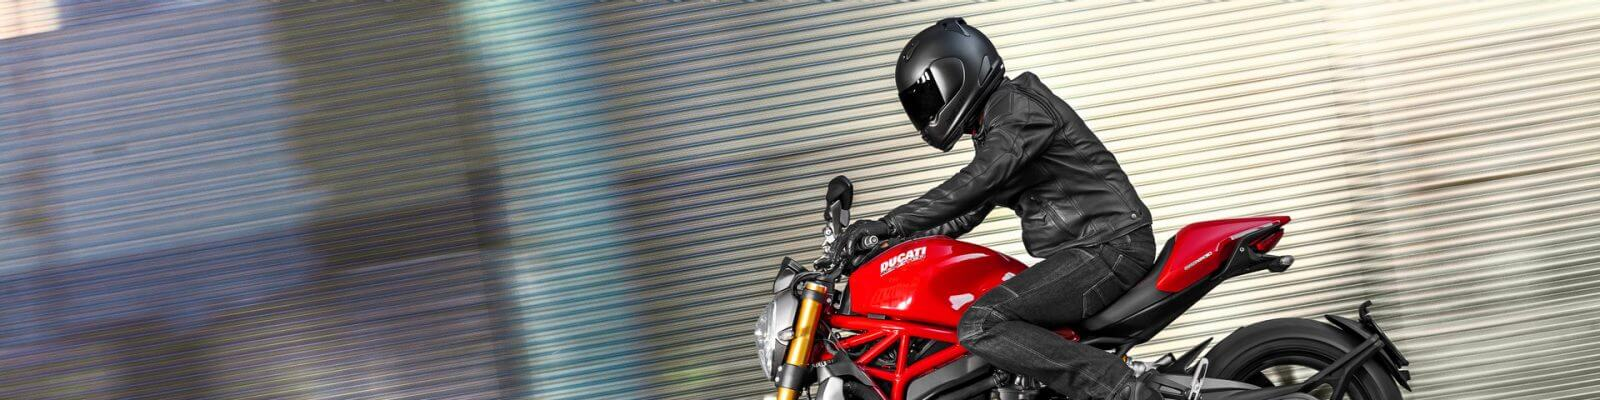 shell advance pentru motociclete